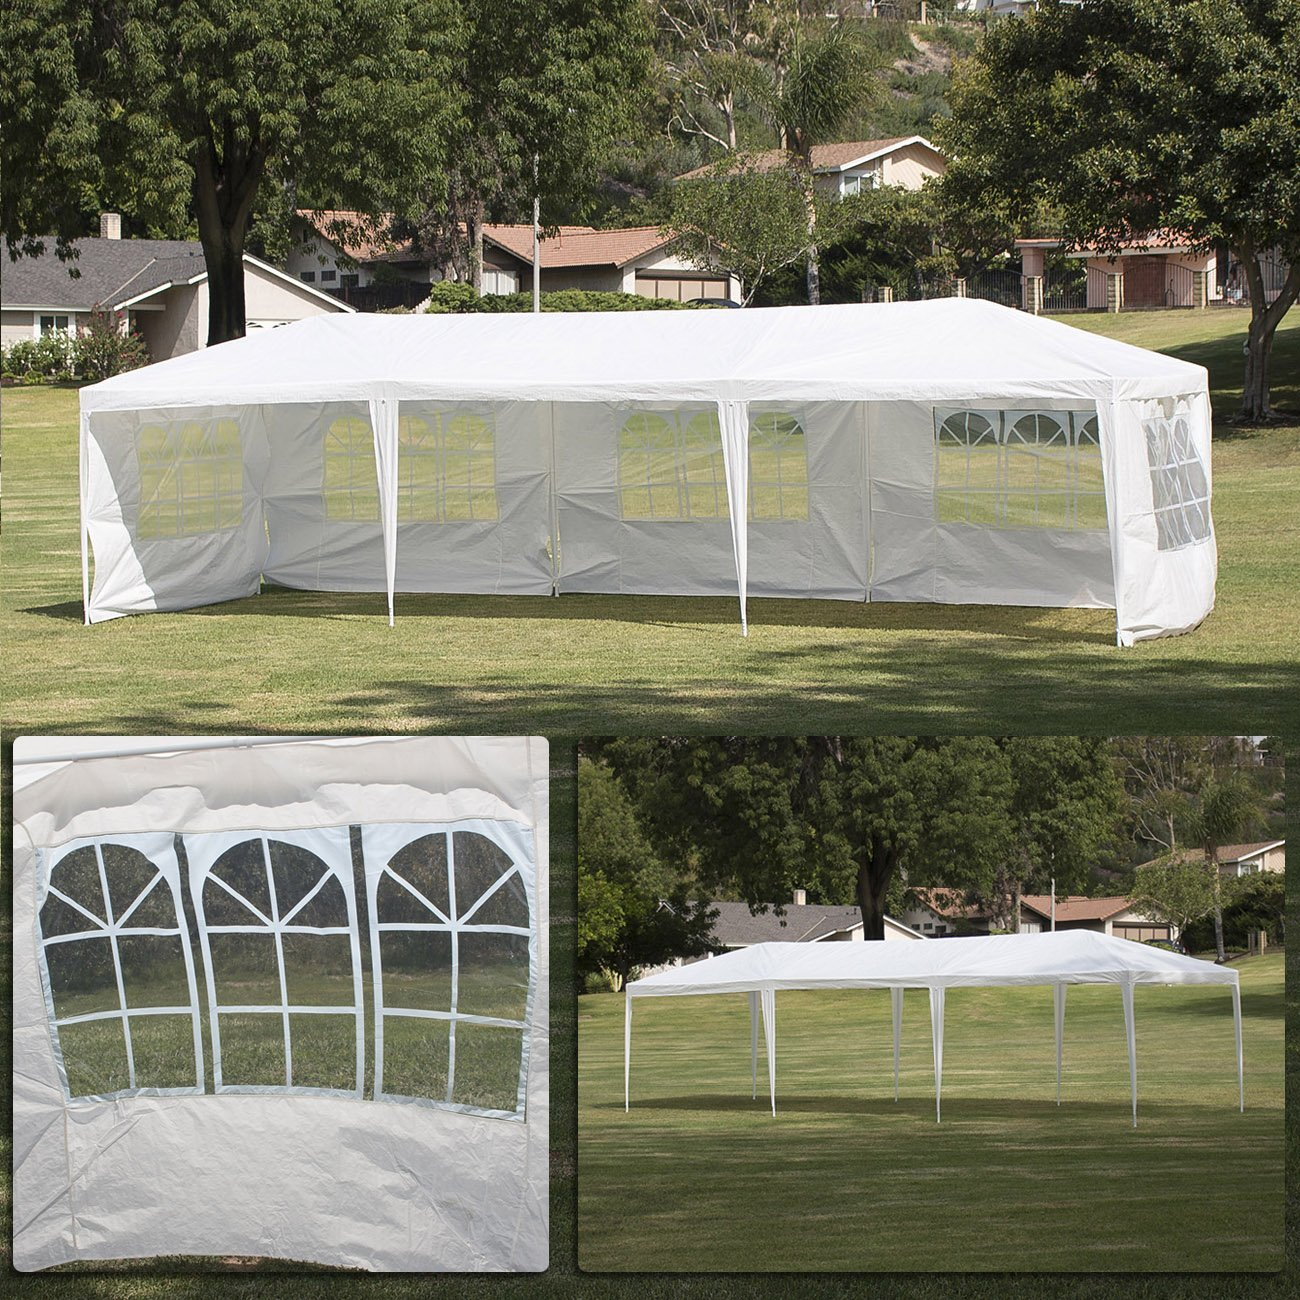 Amazon.com : Belleze 10u0027x30u0027 Canopy Party Wedding Outdoor Tent Shade (5)  Removable Side Wall, White : Patio, Lawn U0026 Garden